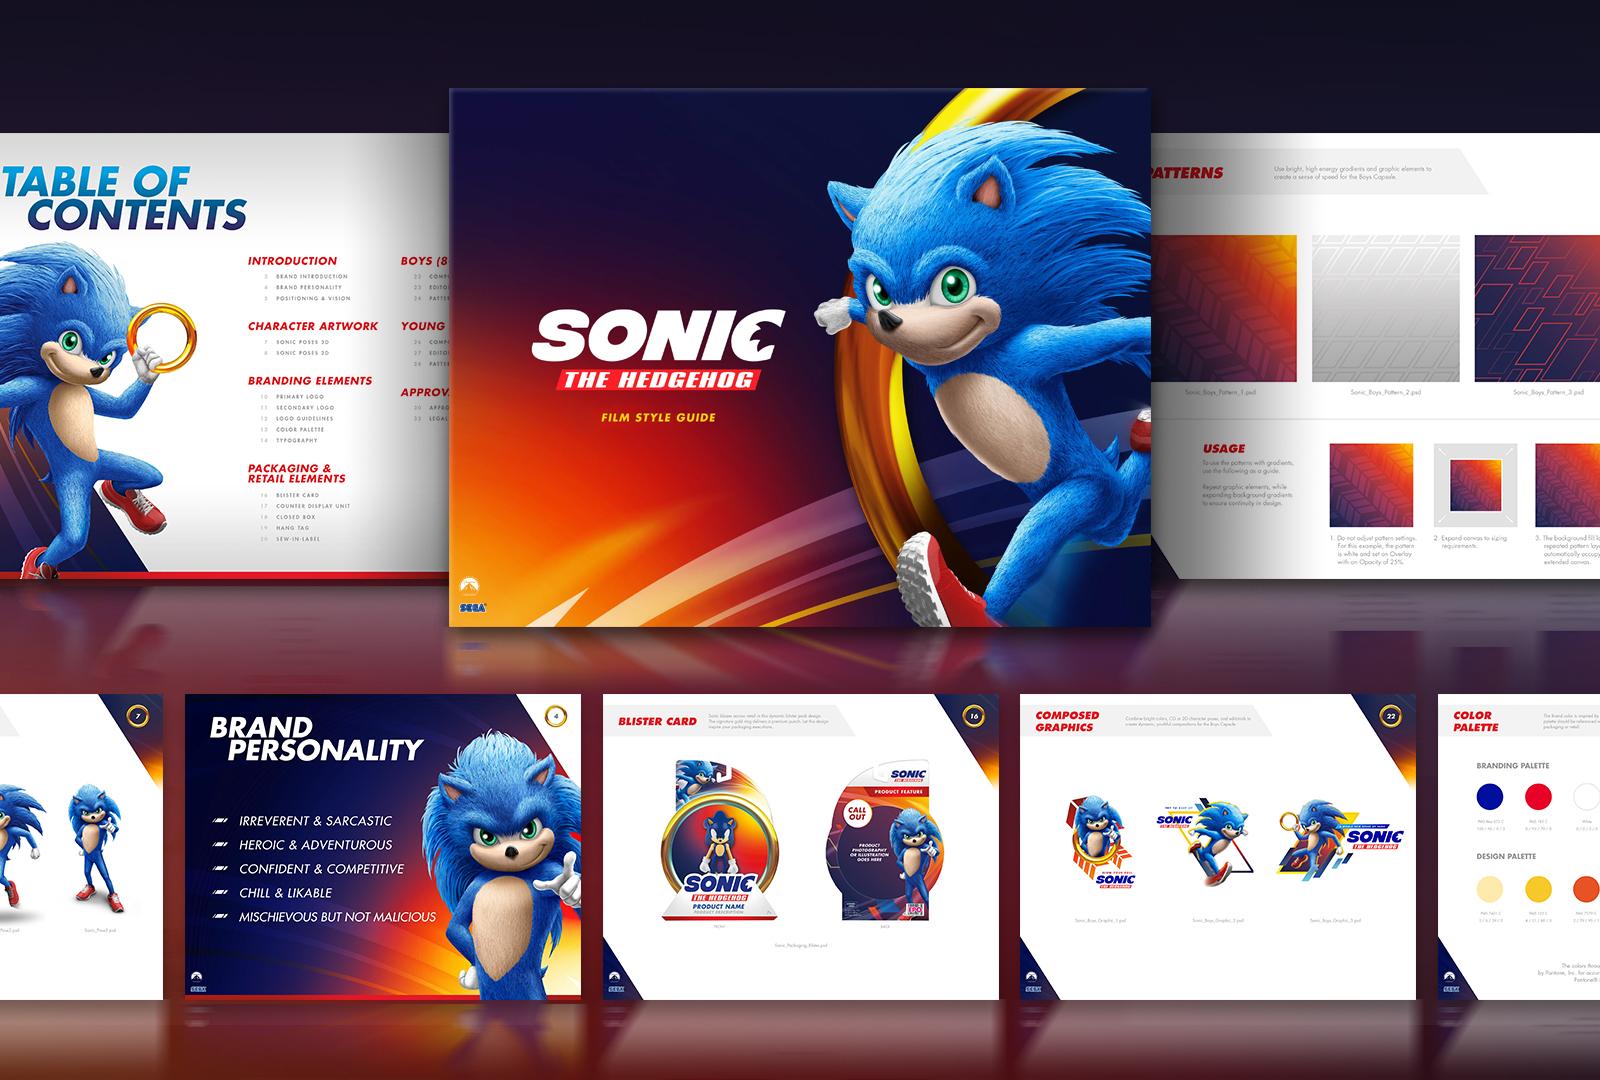 HCI_News_Sonic_PostContent.jpg